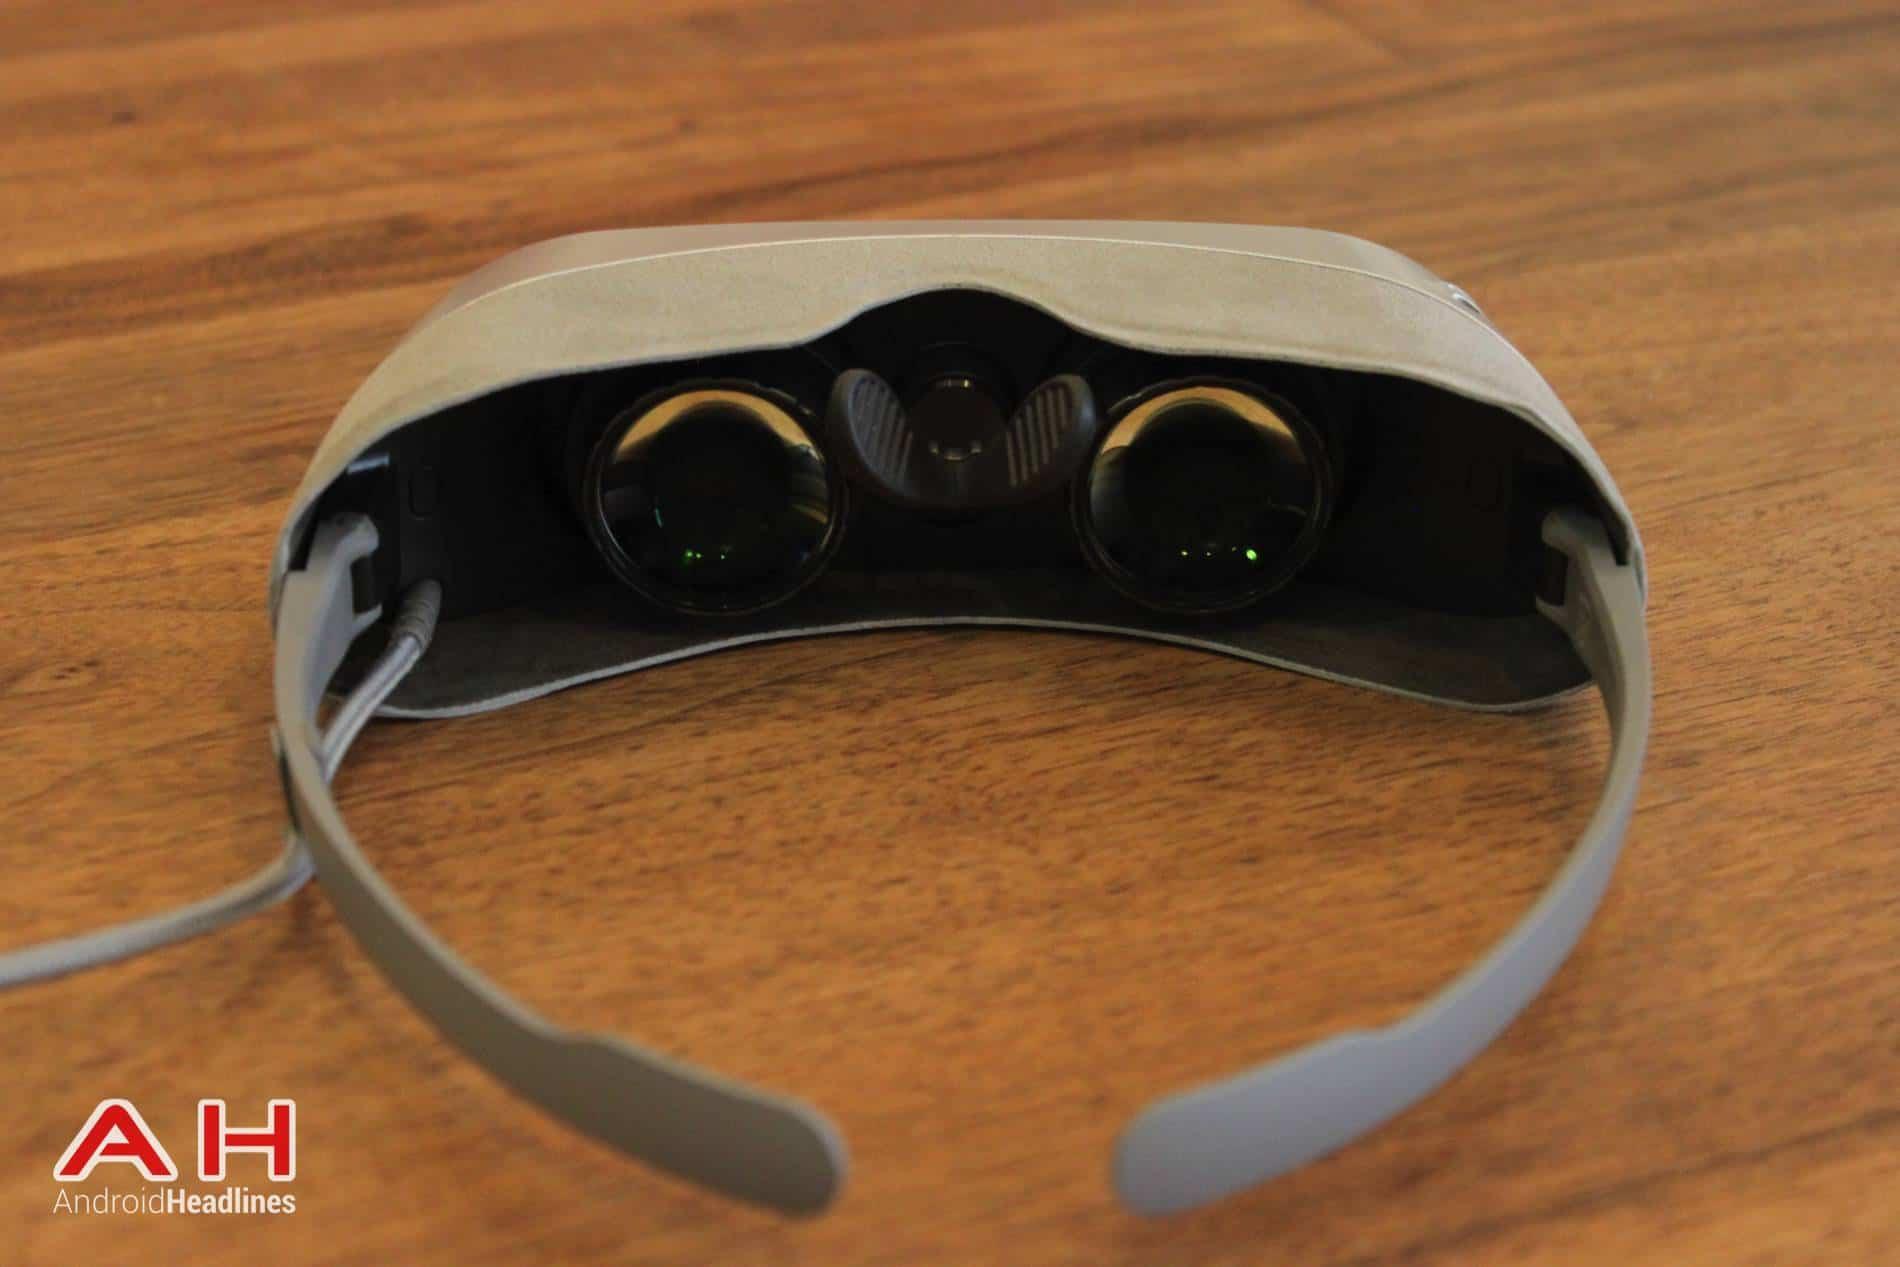 LG G5 VR Headset MWC AH 04